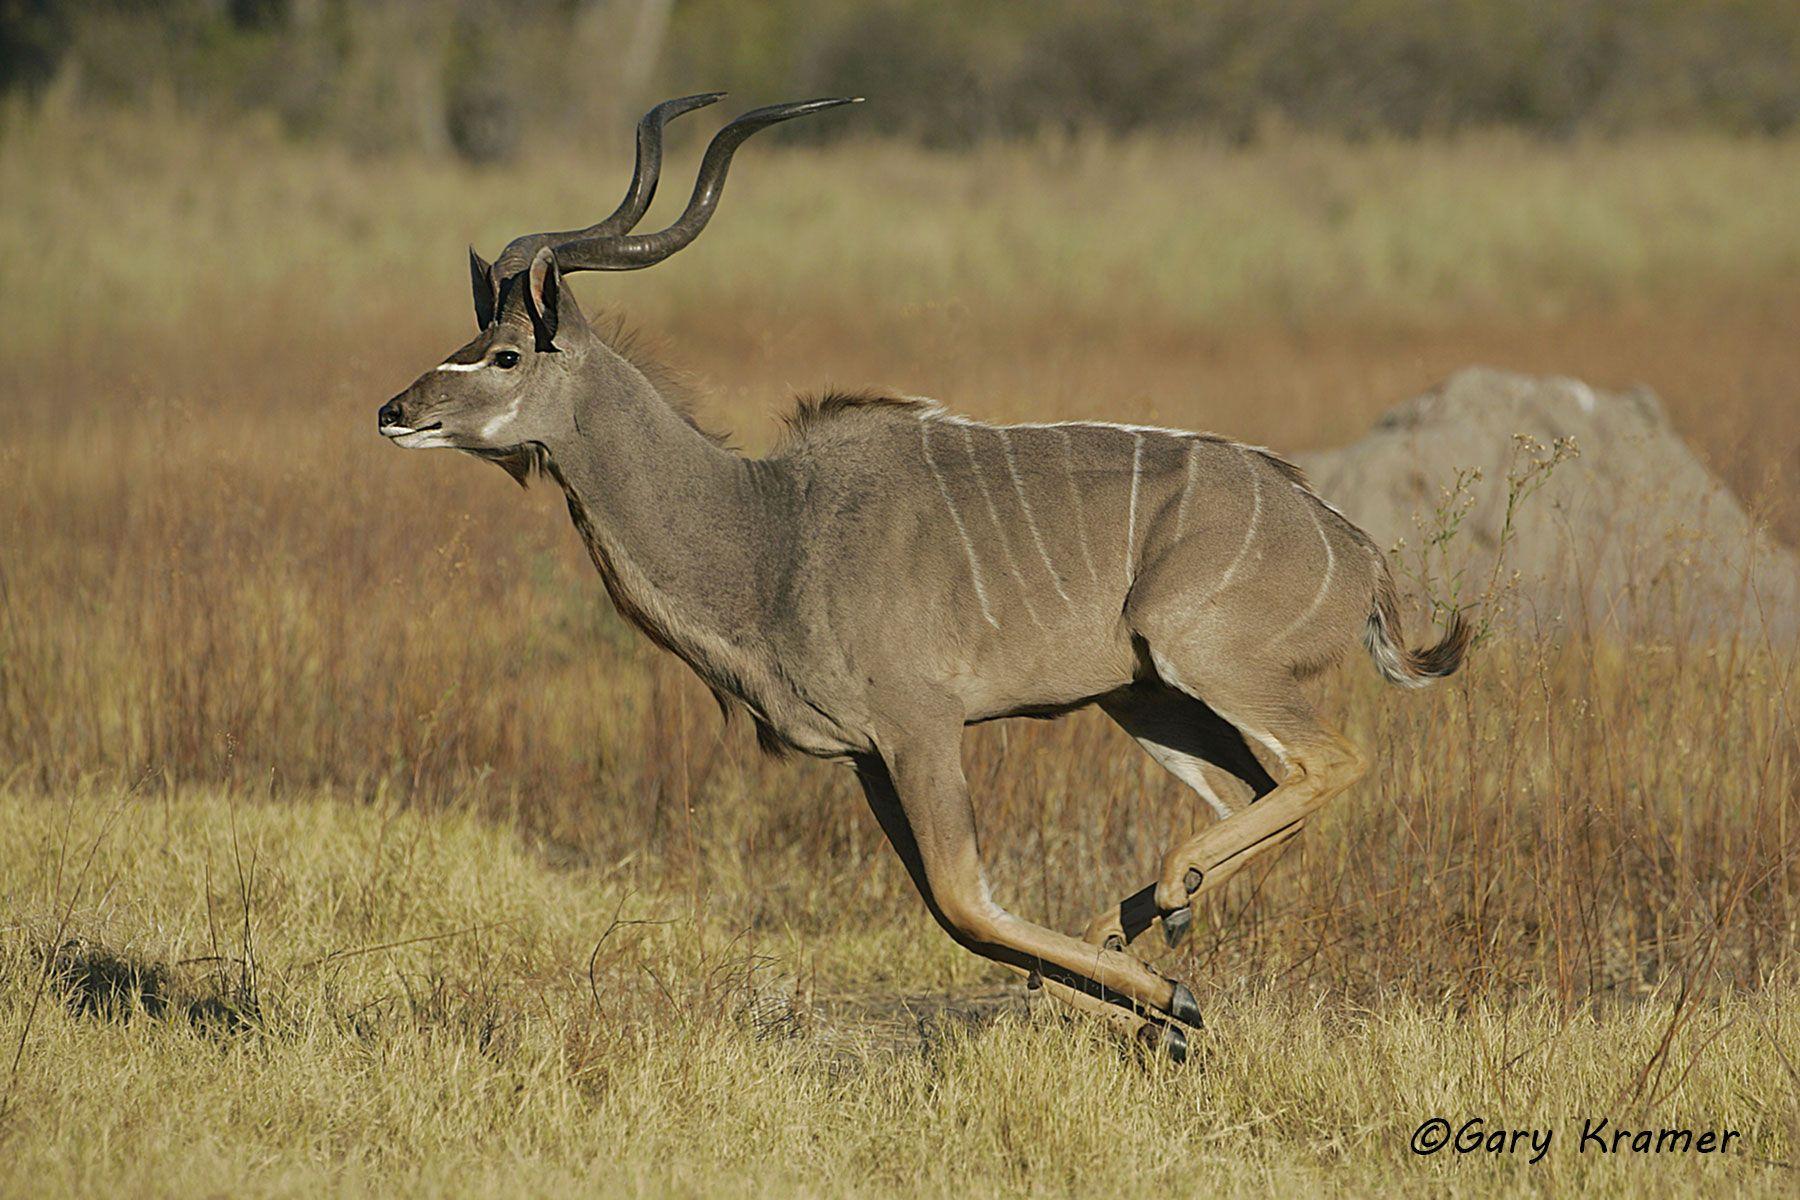 Greater Kudu (Tragelaphus strepsiceros) - AMUK#240d